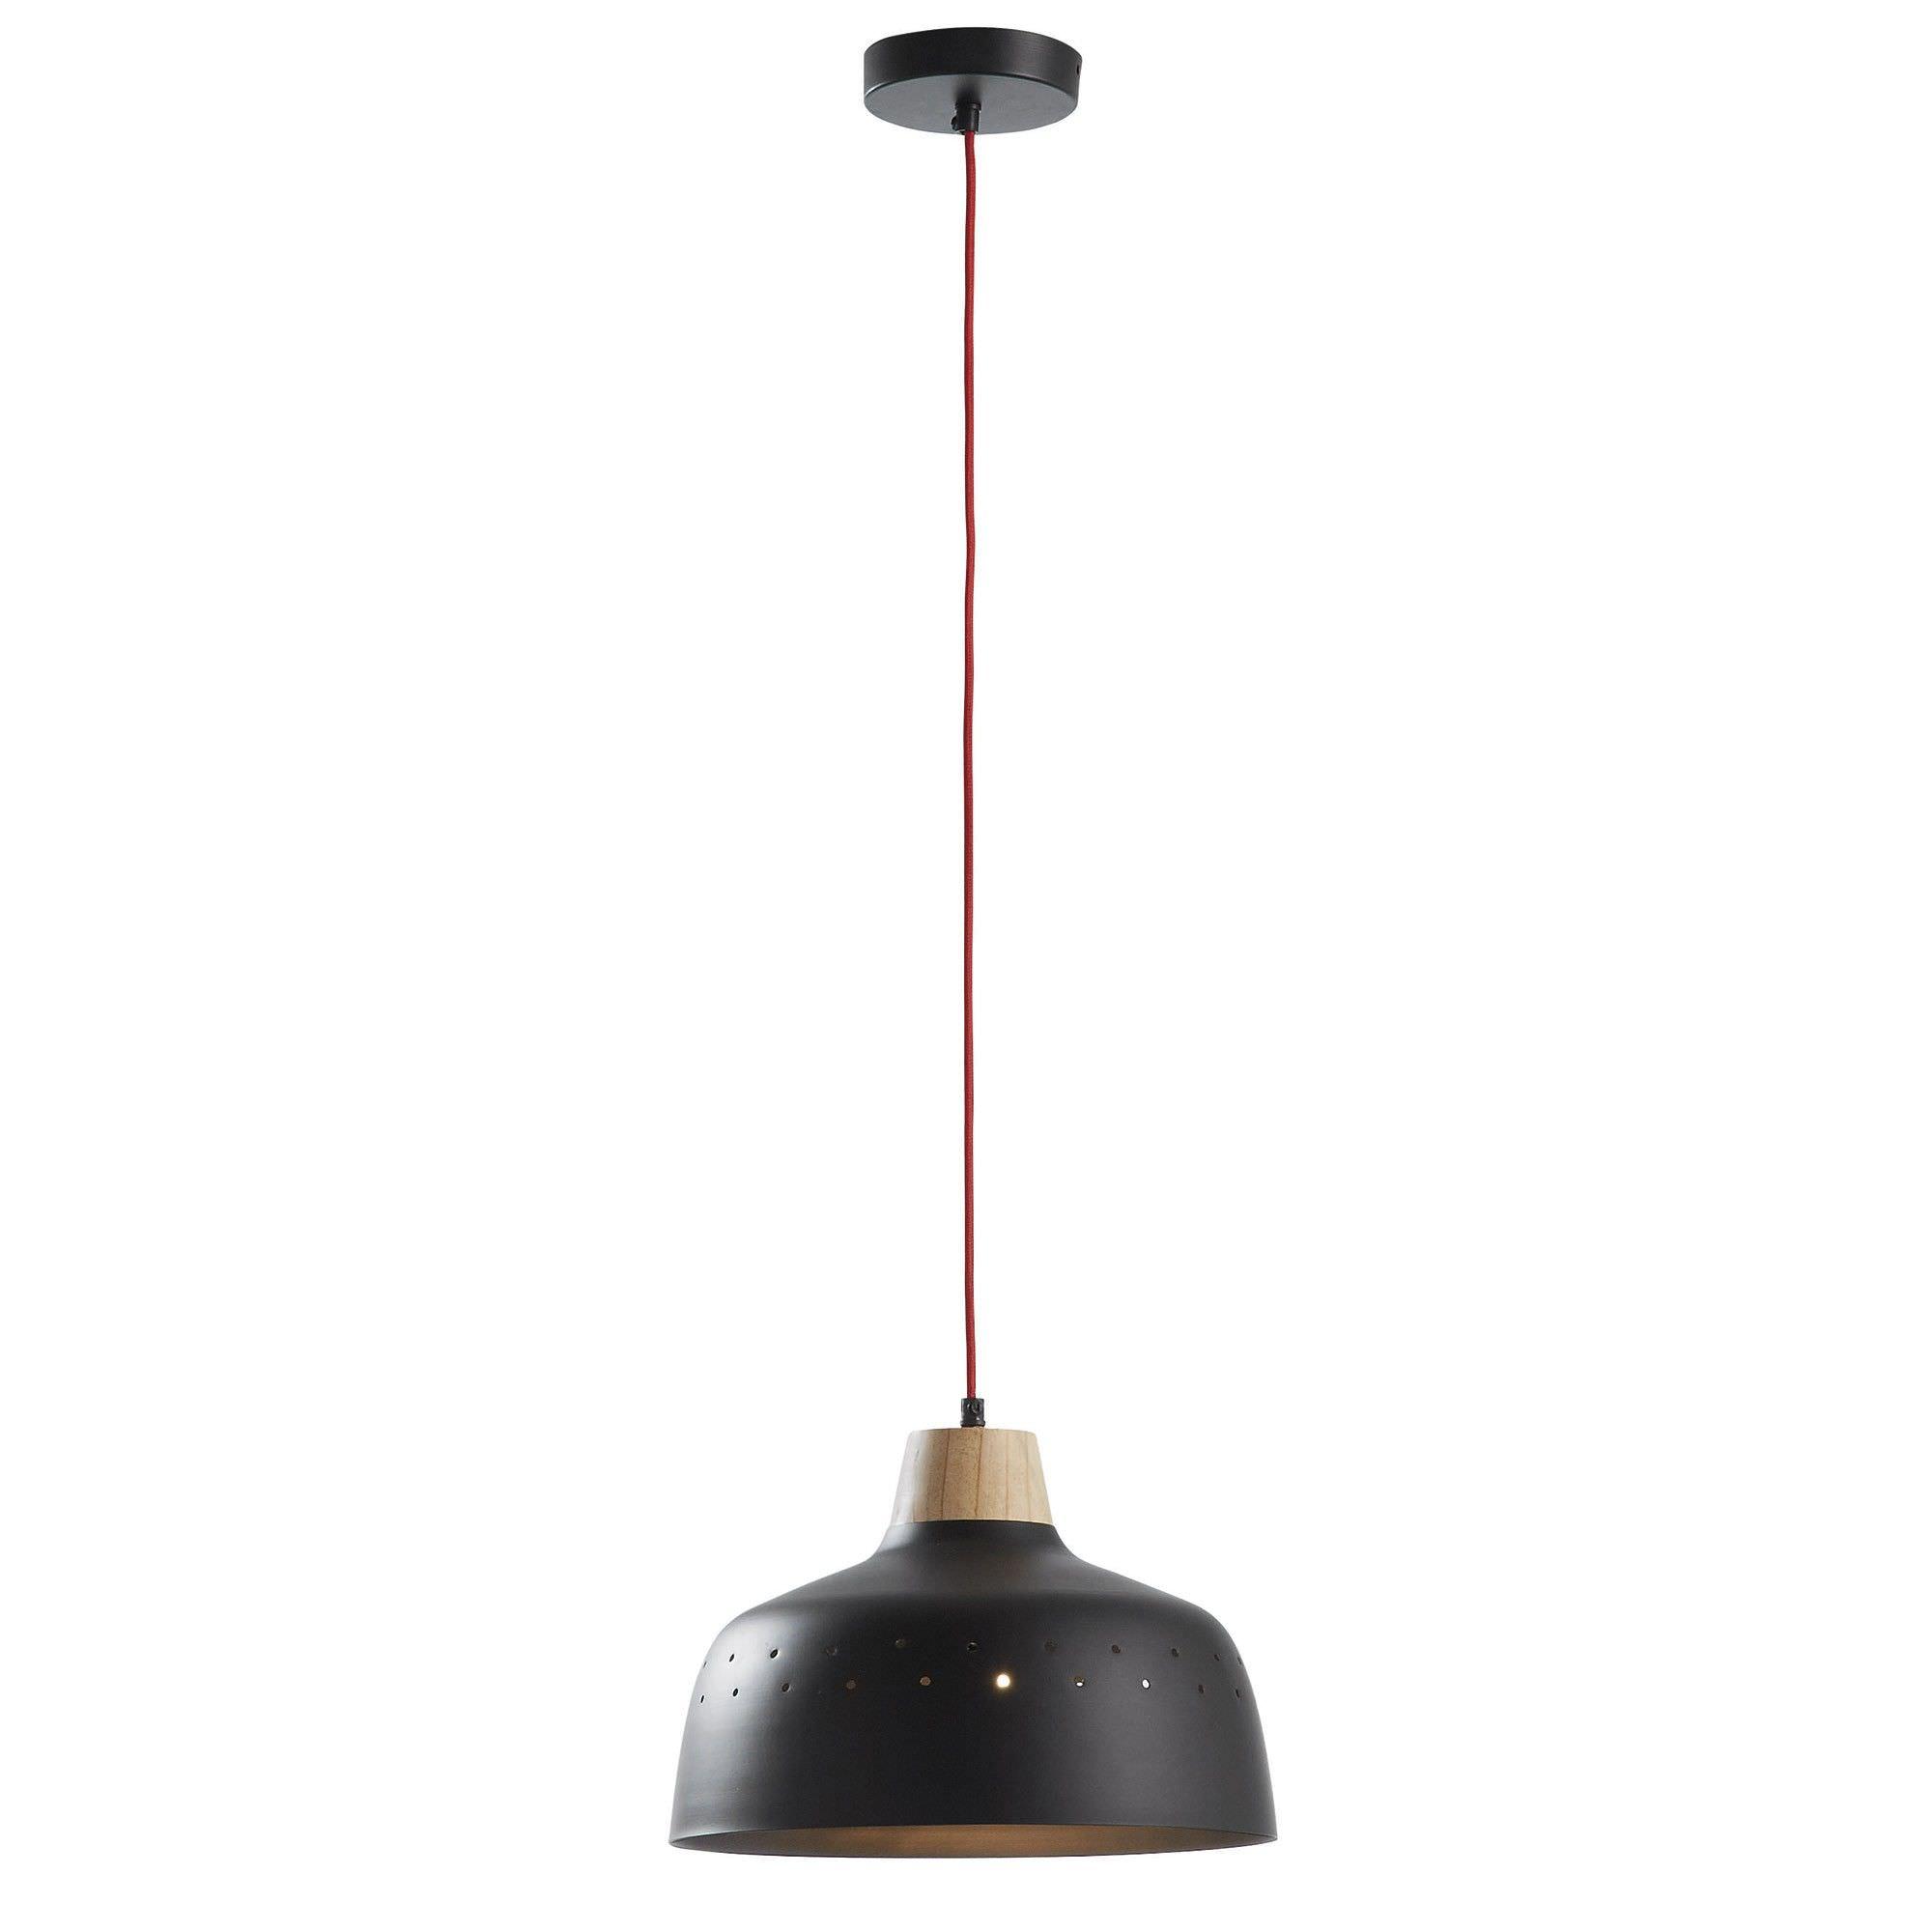 Bodi Steel Pendant Light, Bowl Shade, Black